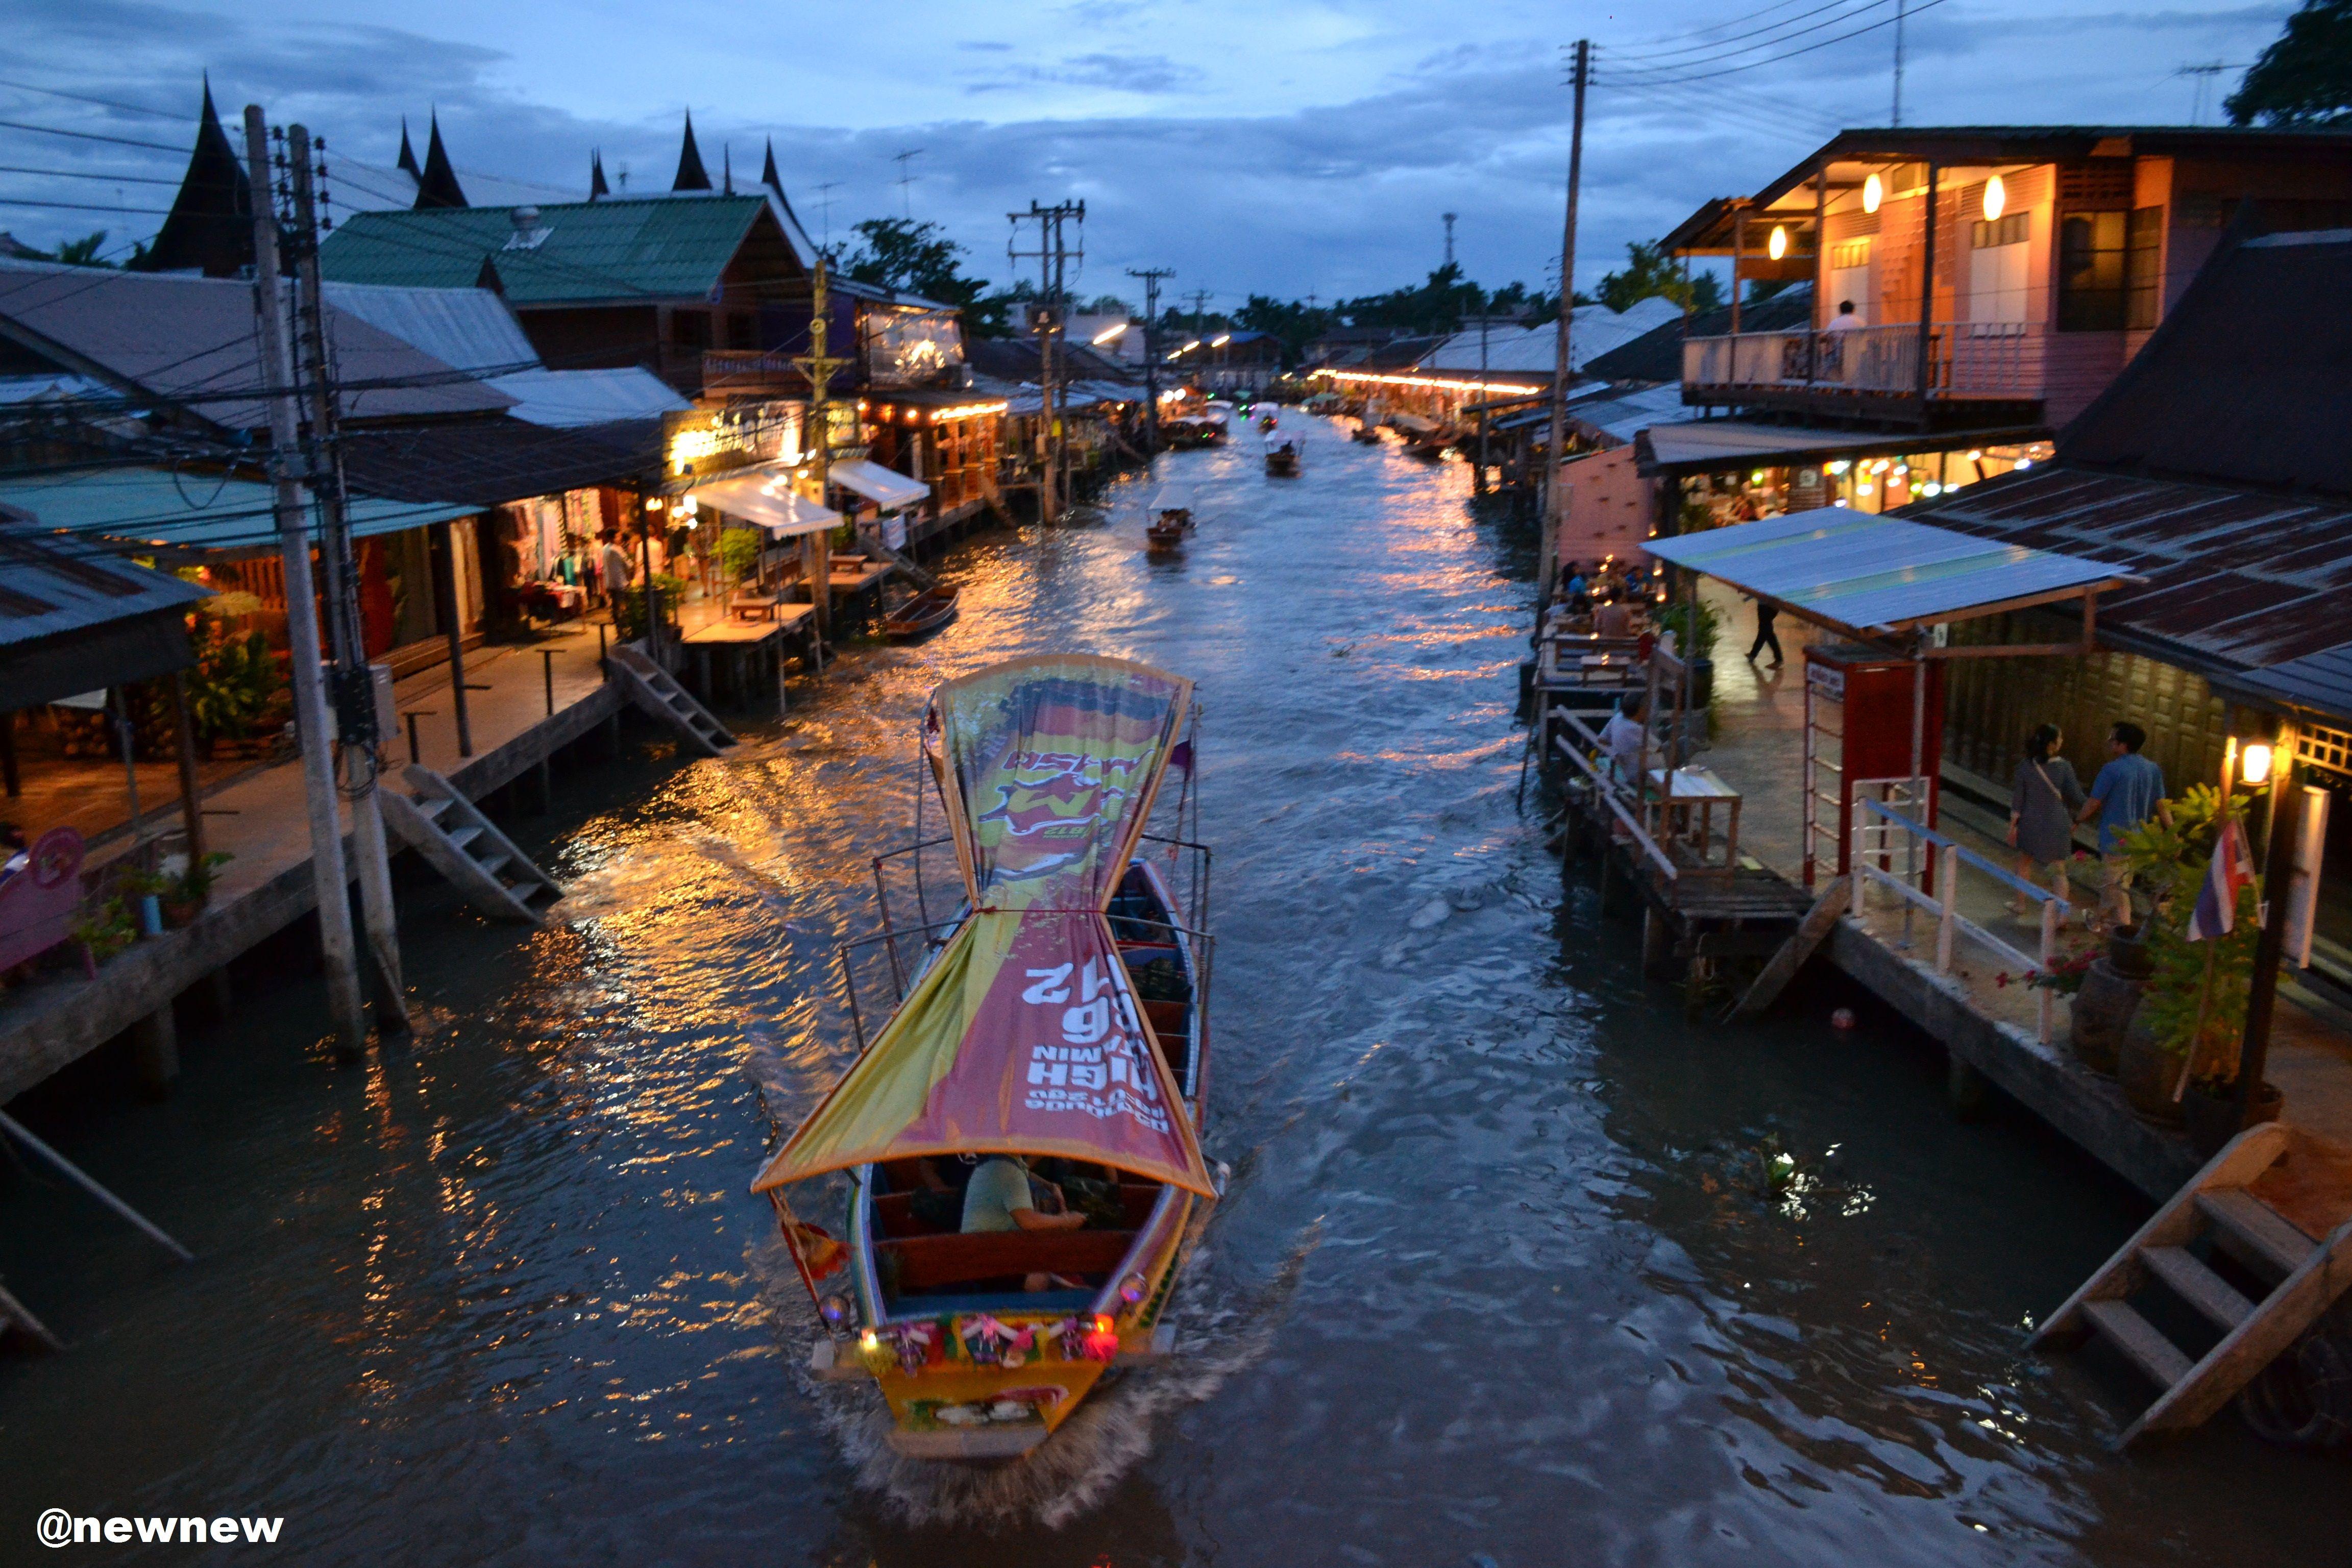 #amphawa #thailand